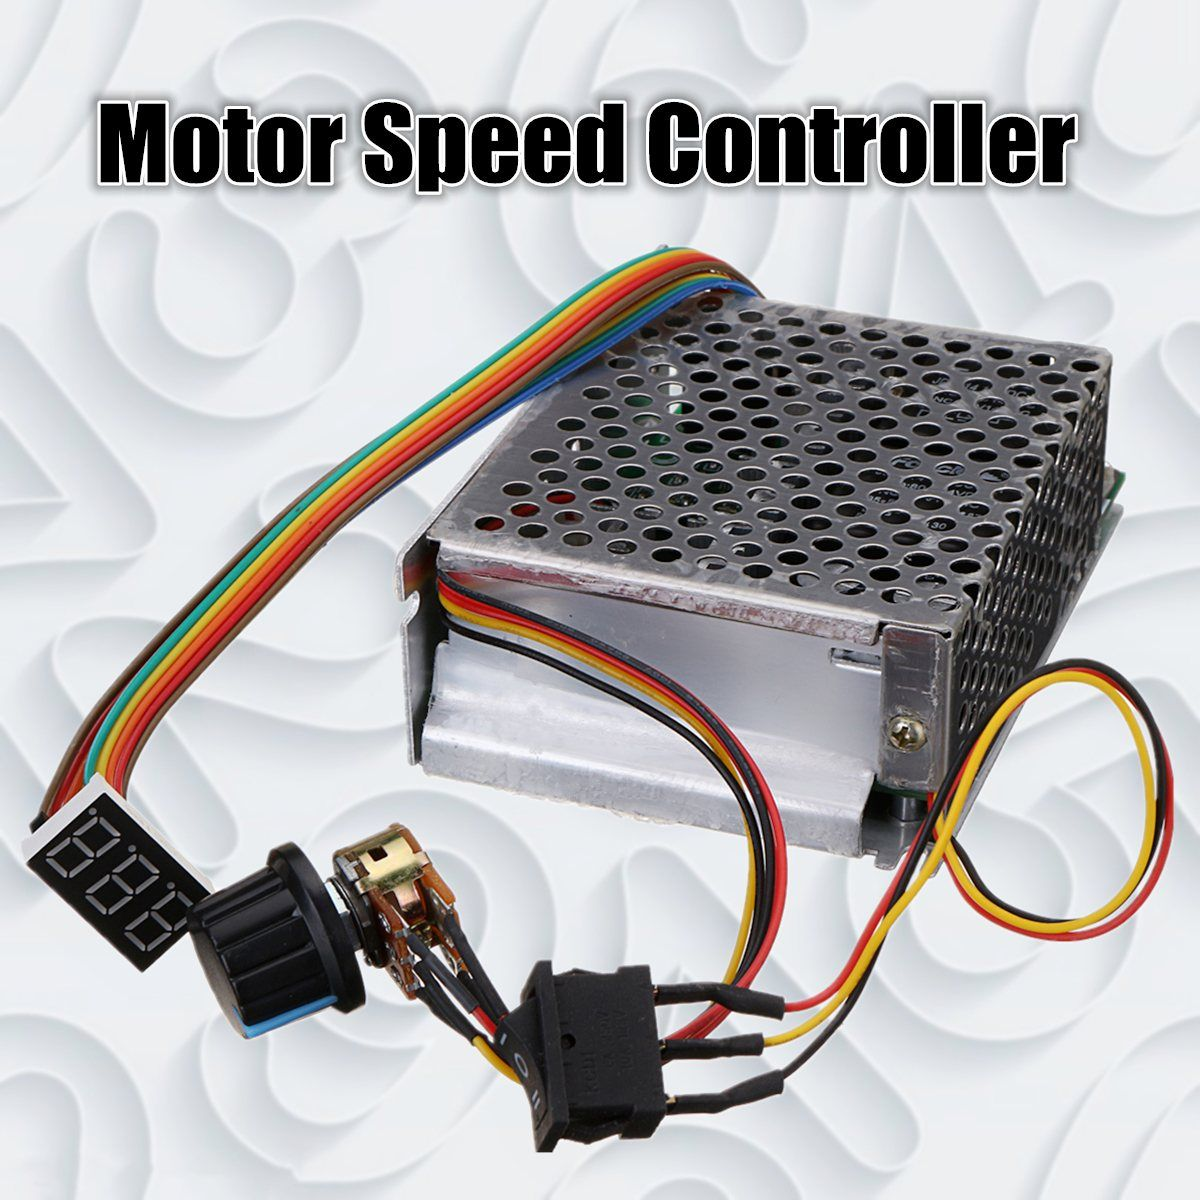 DC10-50V 60A 3000W Reversible DC Motor Speed Controller PWM Control 12V 24V 36V 48V Forward-Stop-Reversal Brake Digital Display